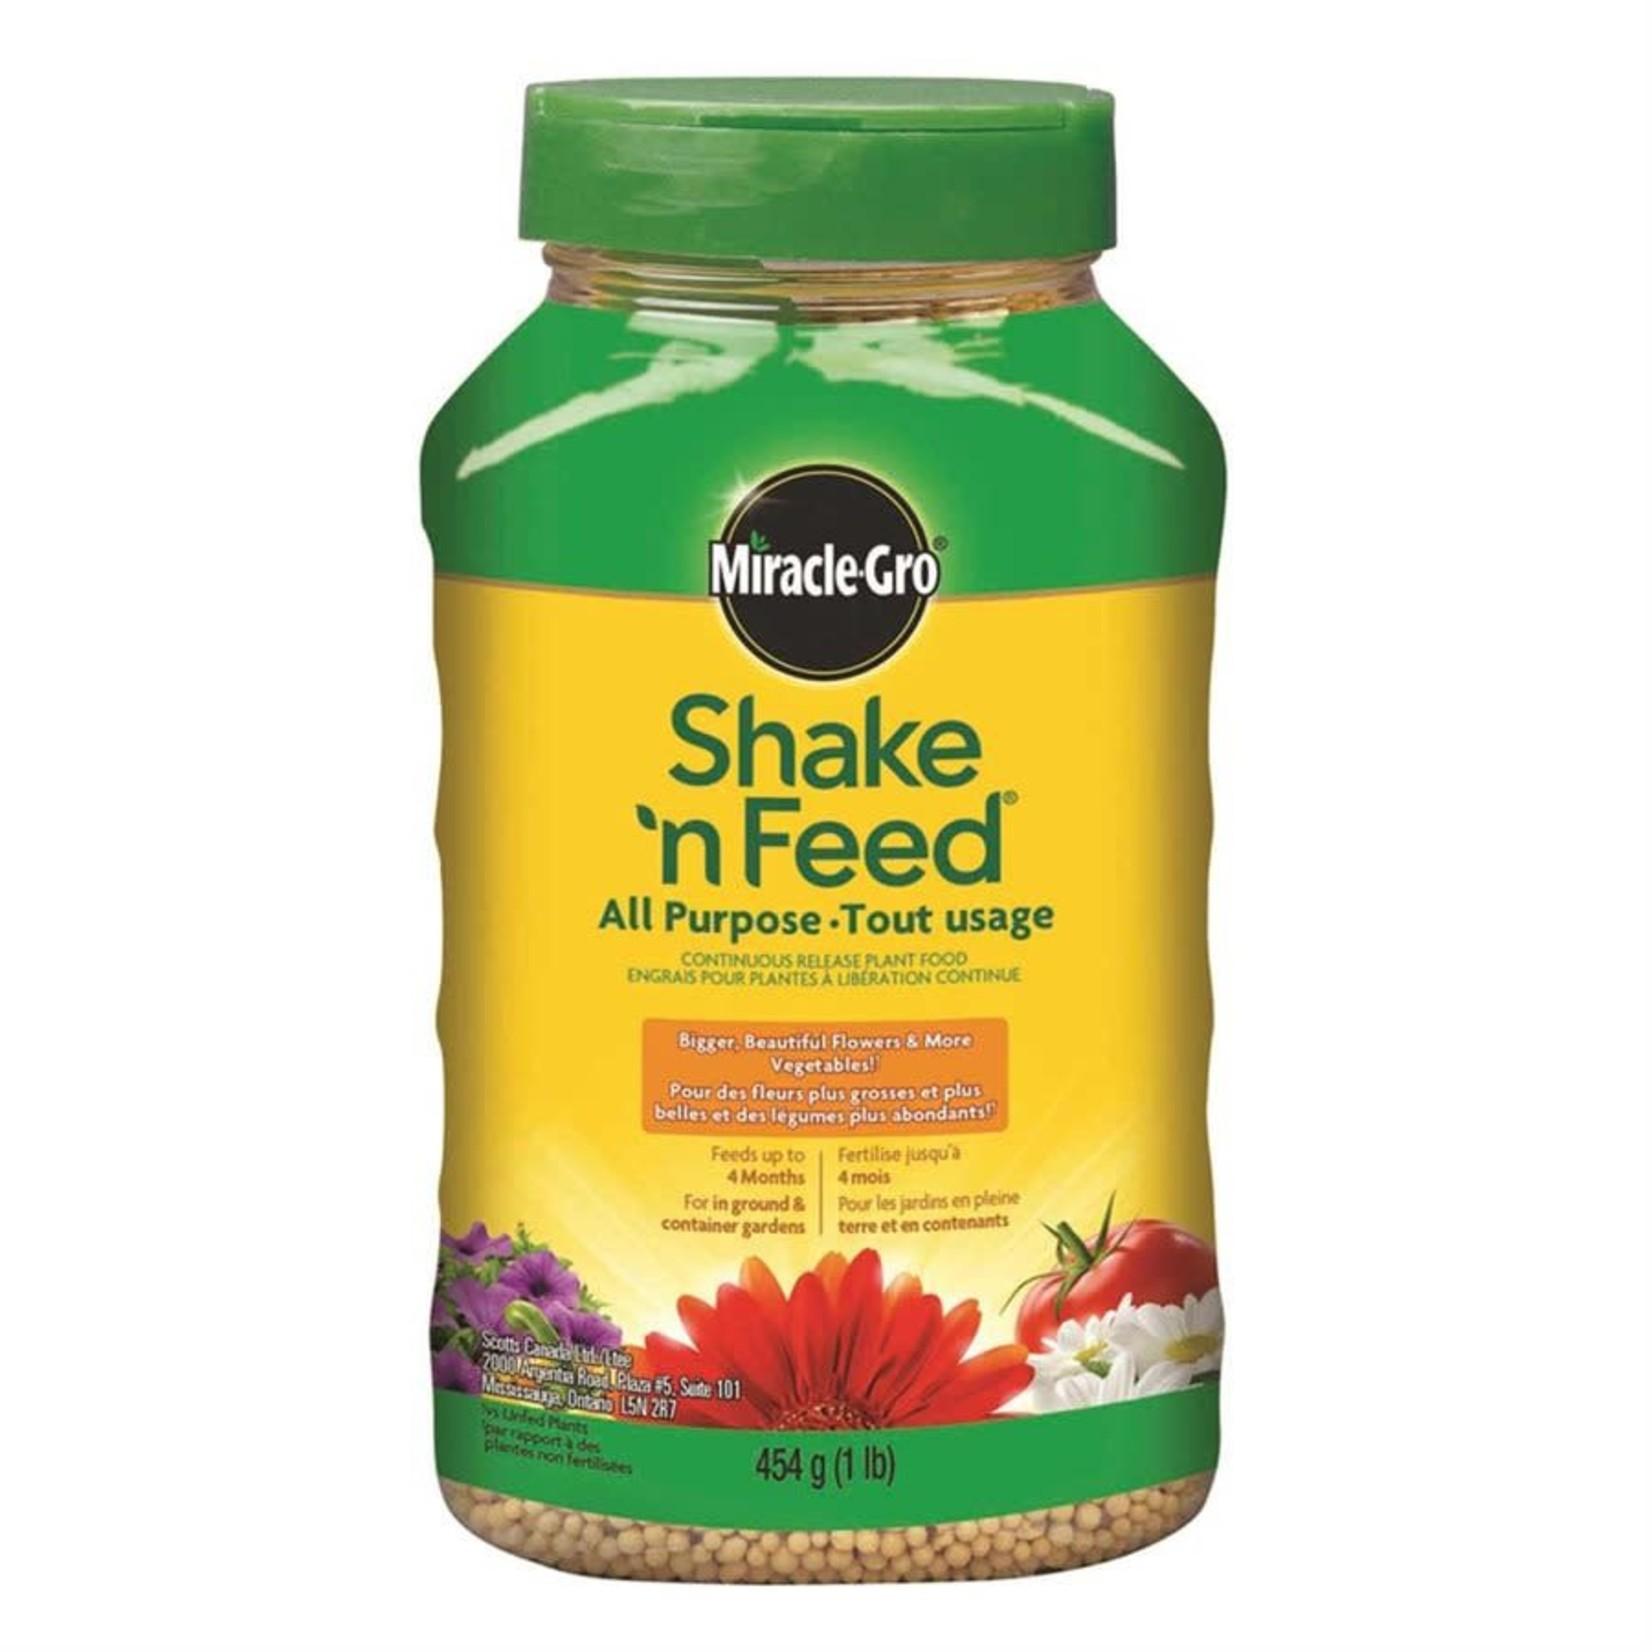 Miracle-Gro Shake 'n Feed All Purpose 453g